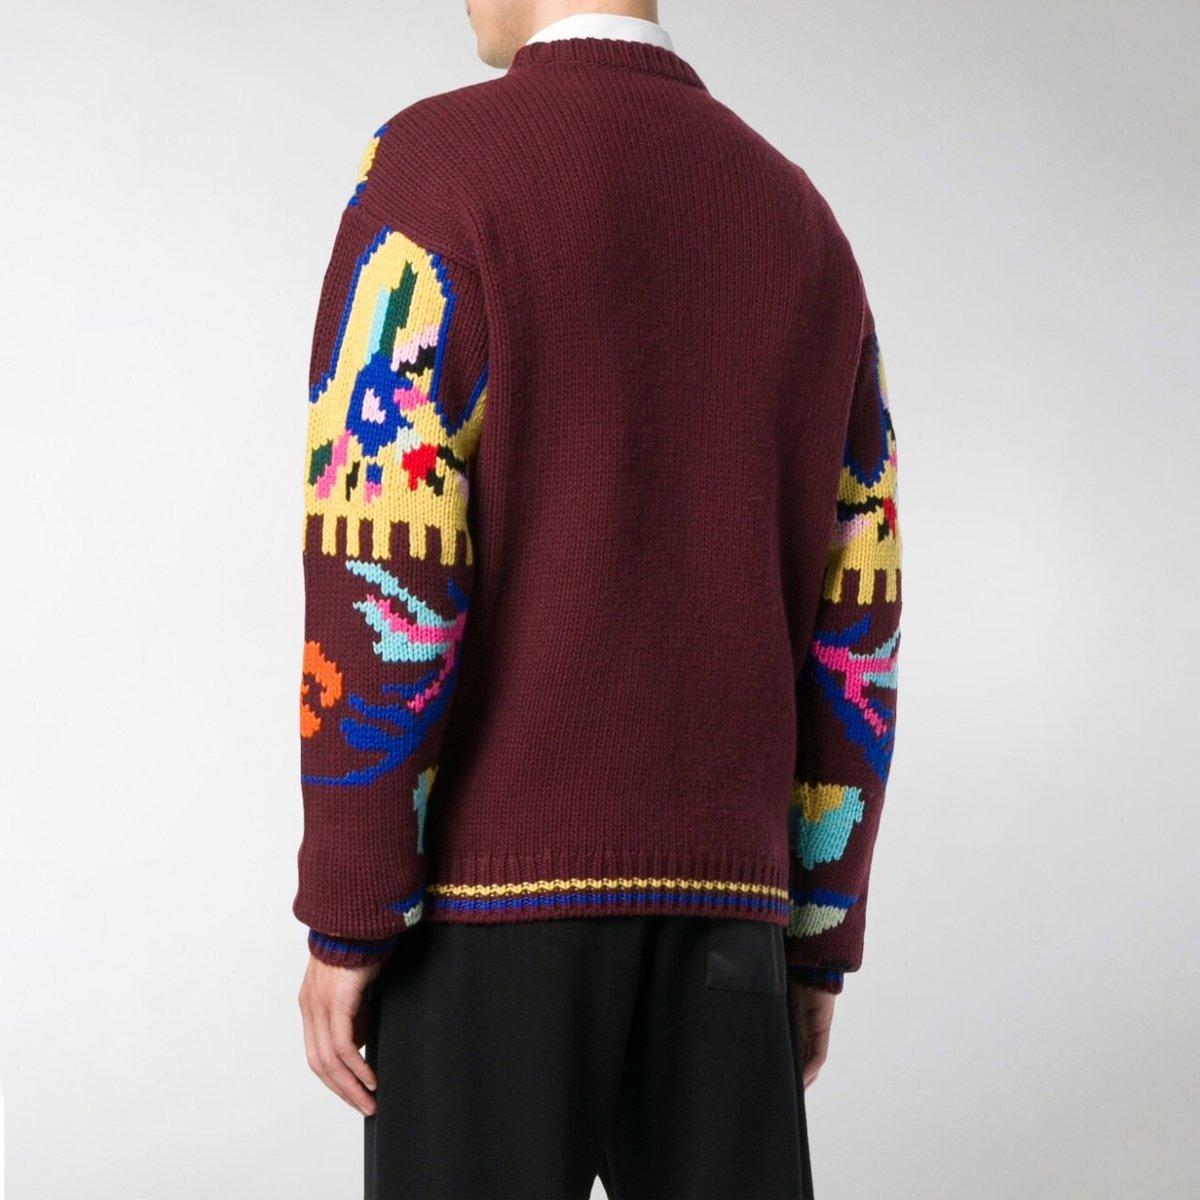 prada-intarsia-knit-sweater_13195880_15625669_1000.jpg